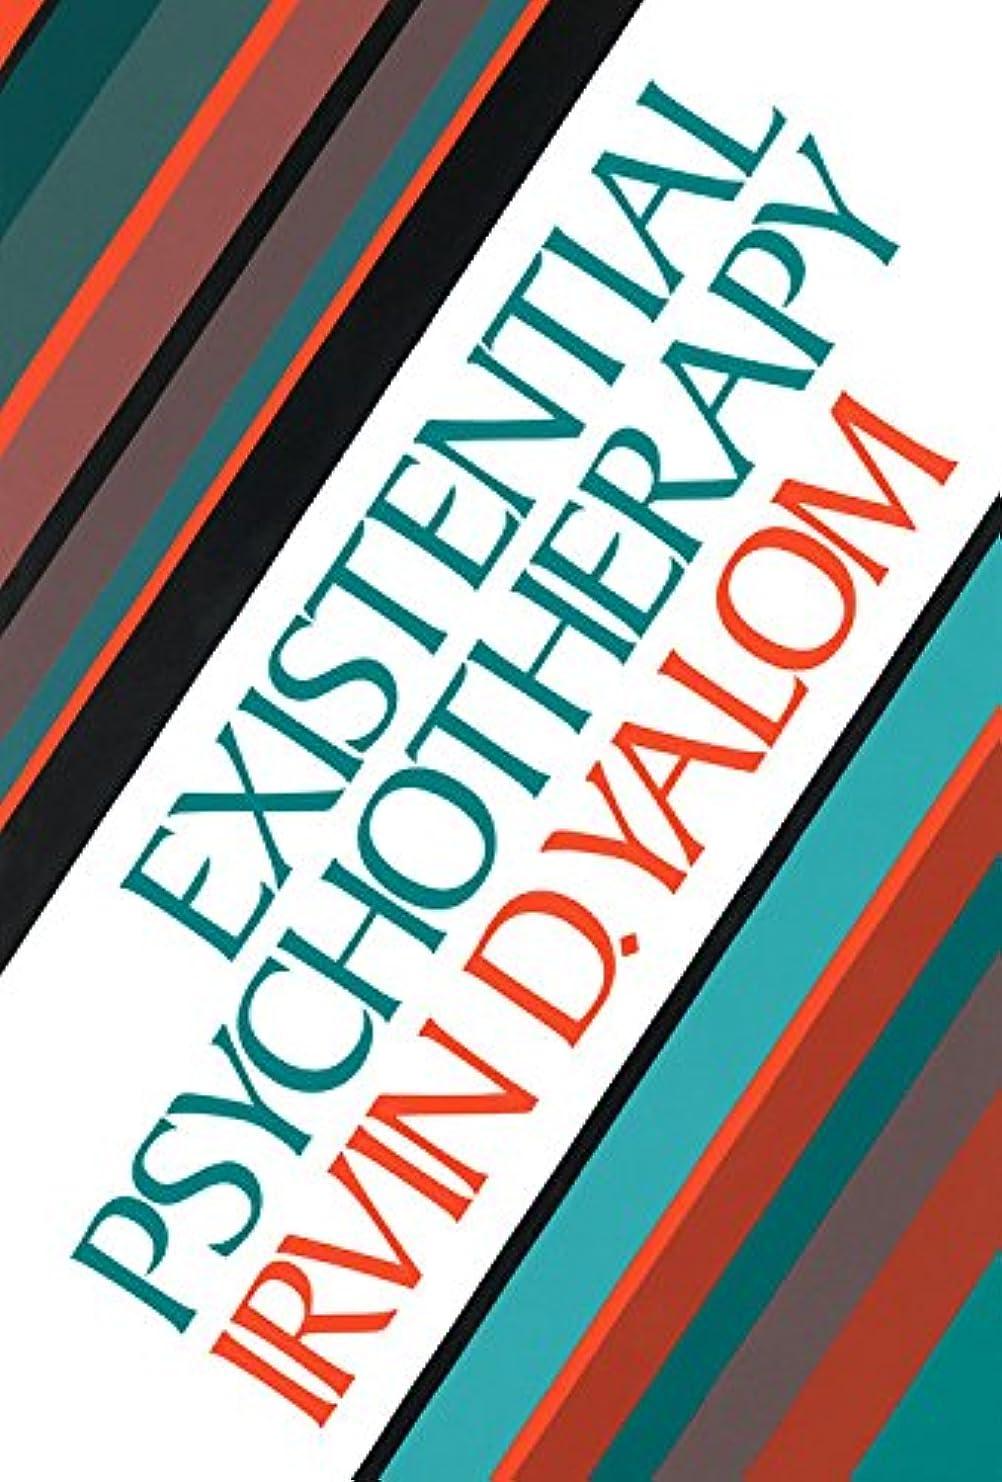 光沢発症残酷Handbook of Identity Theory and Research (2 Vol Set)